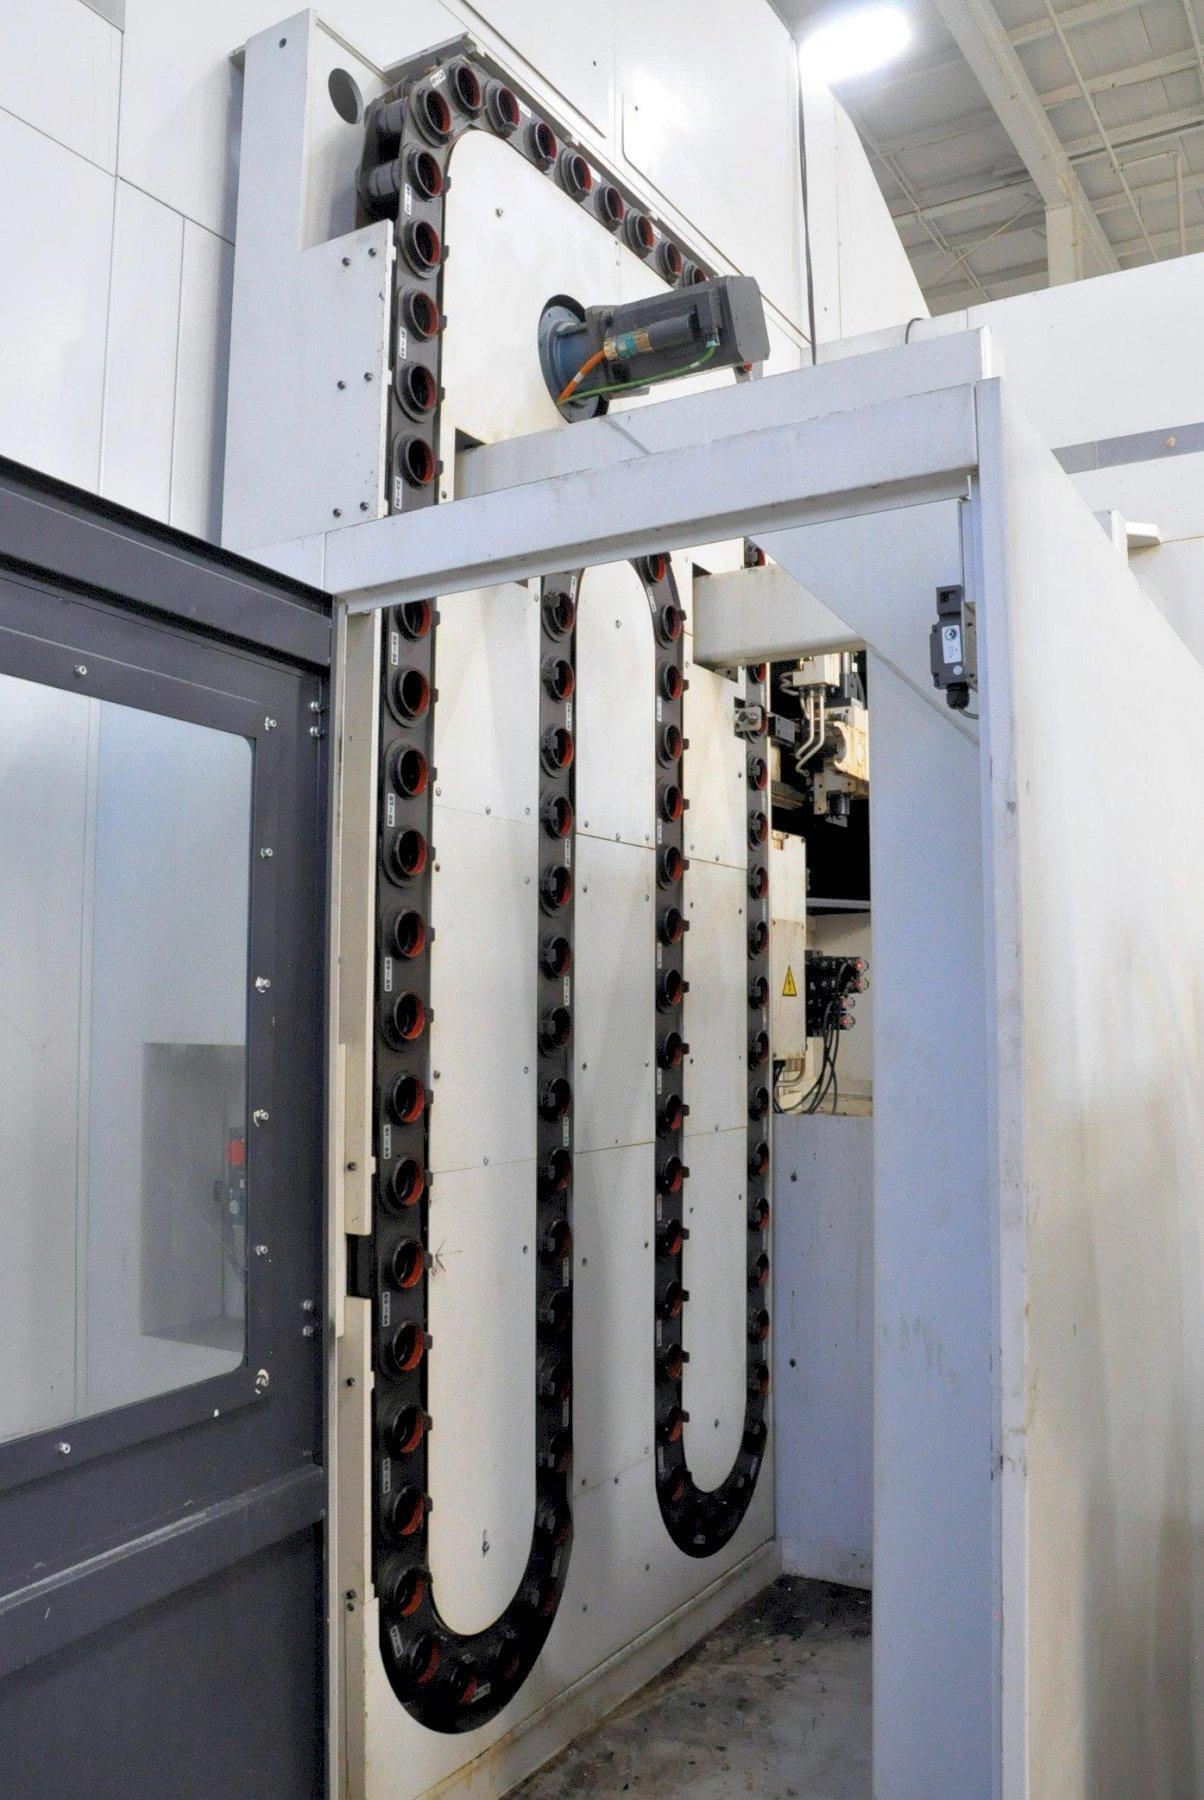 Giddings & Lewis HMC-1250 CNC Horizontal Machining Center